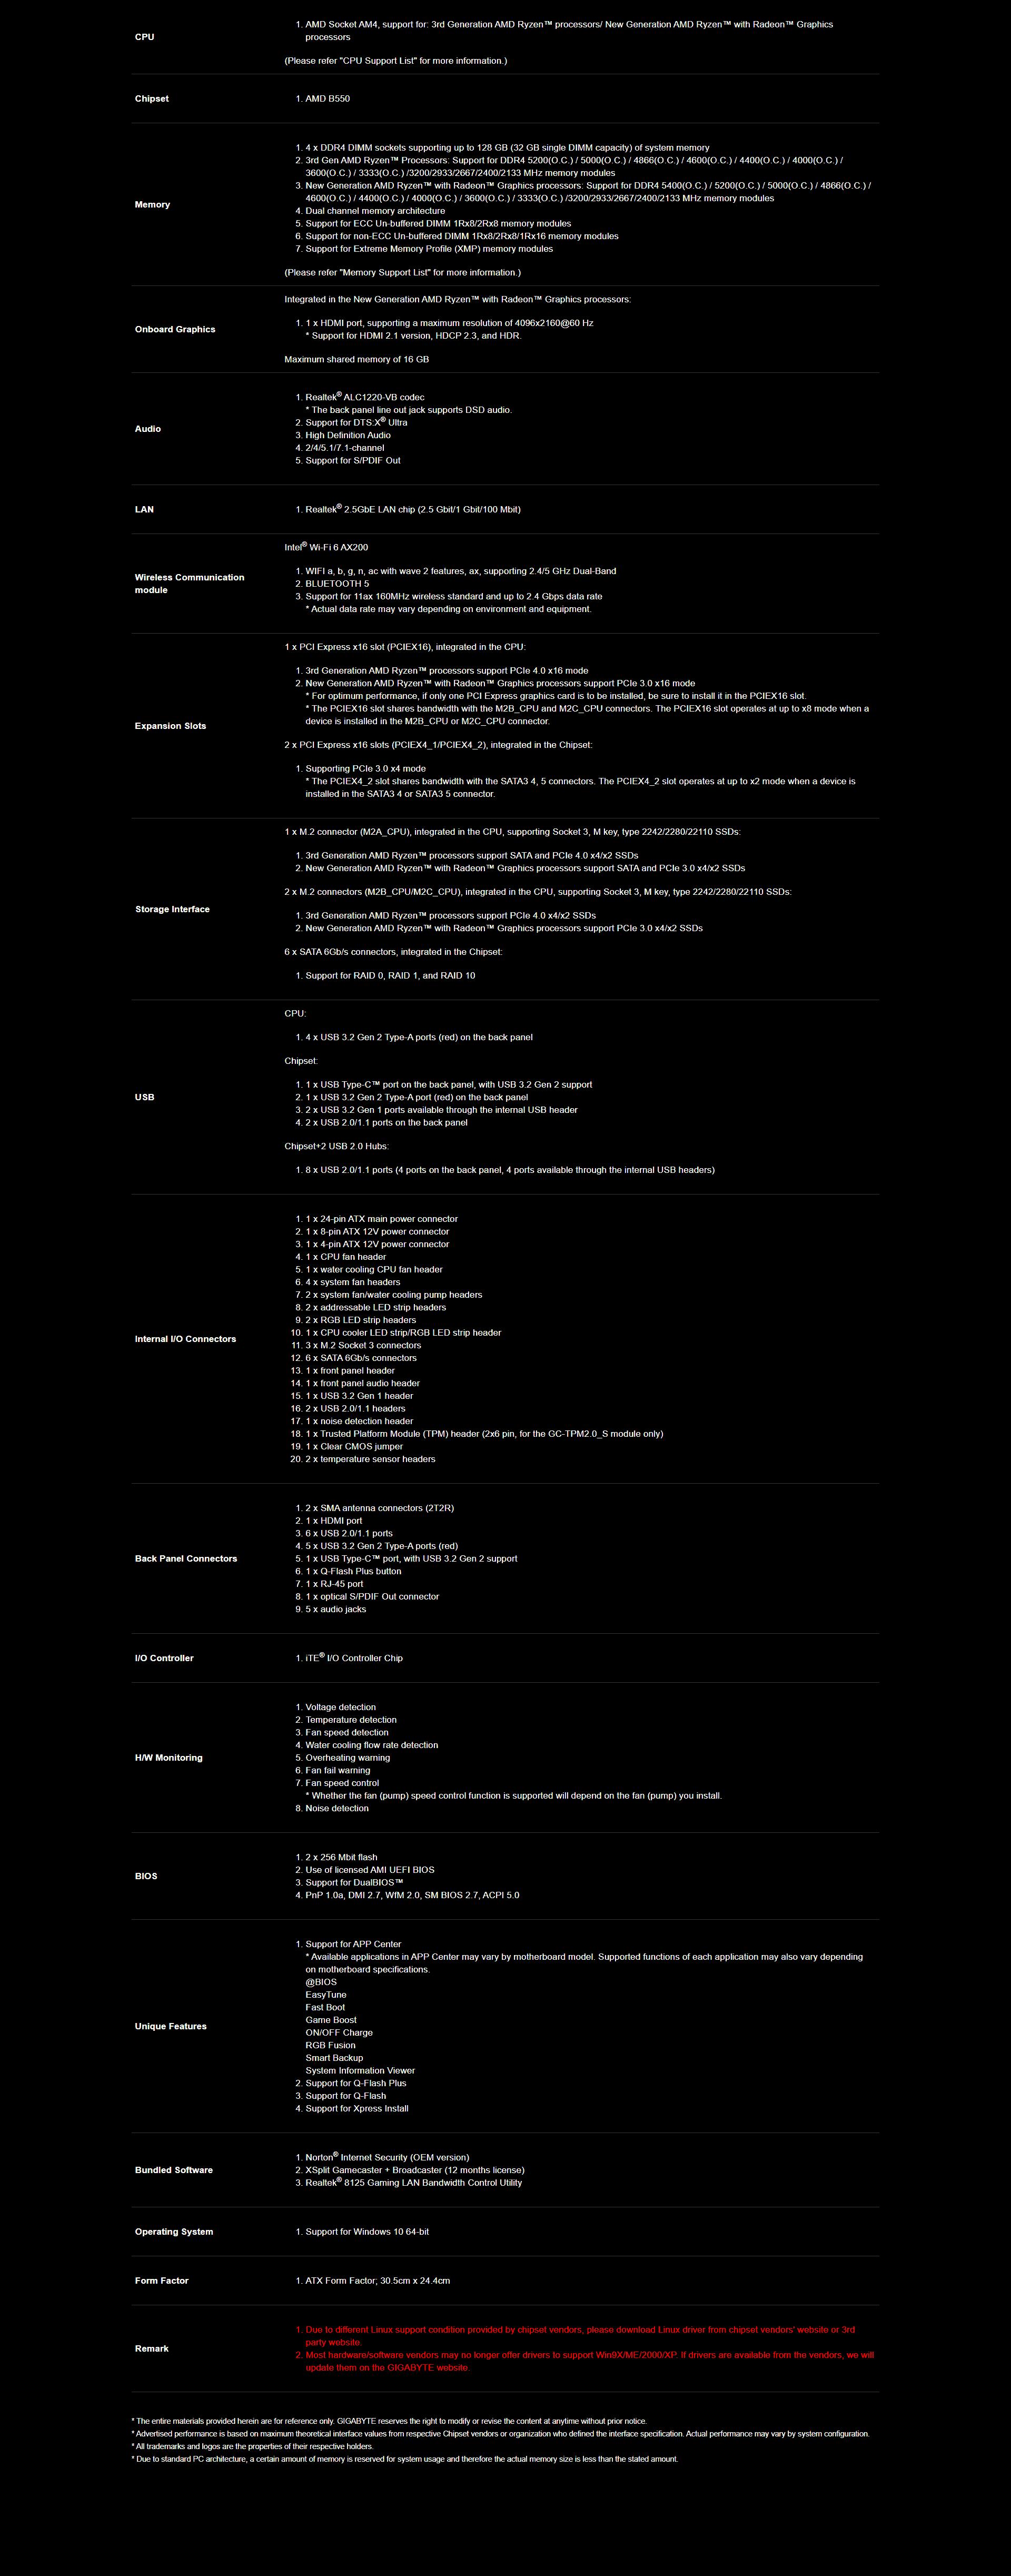 Gigabyte B550 AORUS MASTER (rev. 1.0) Motherboard